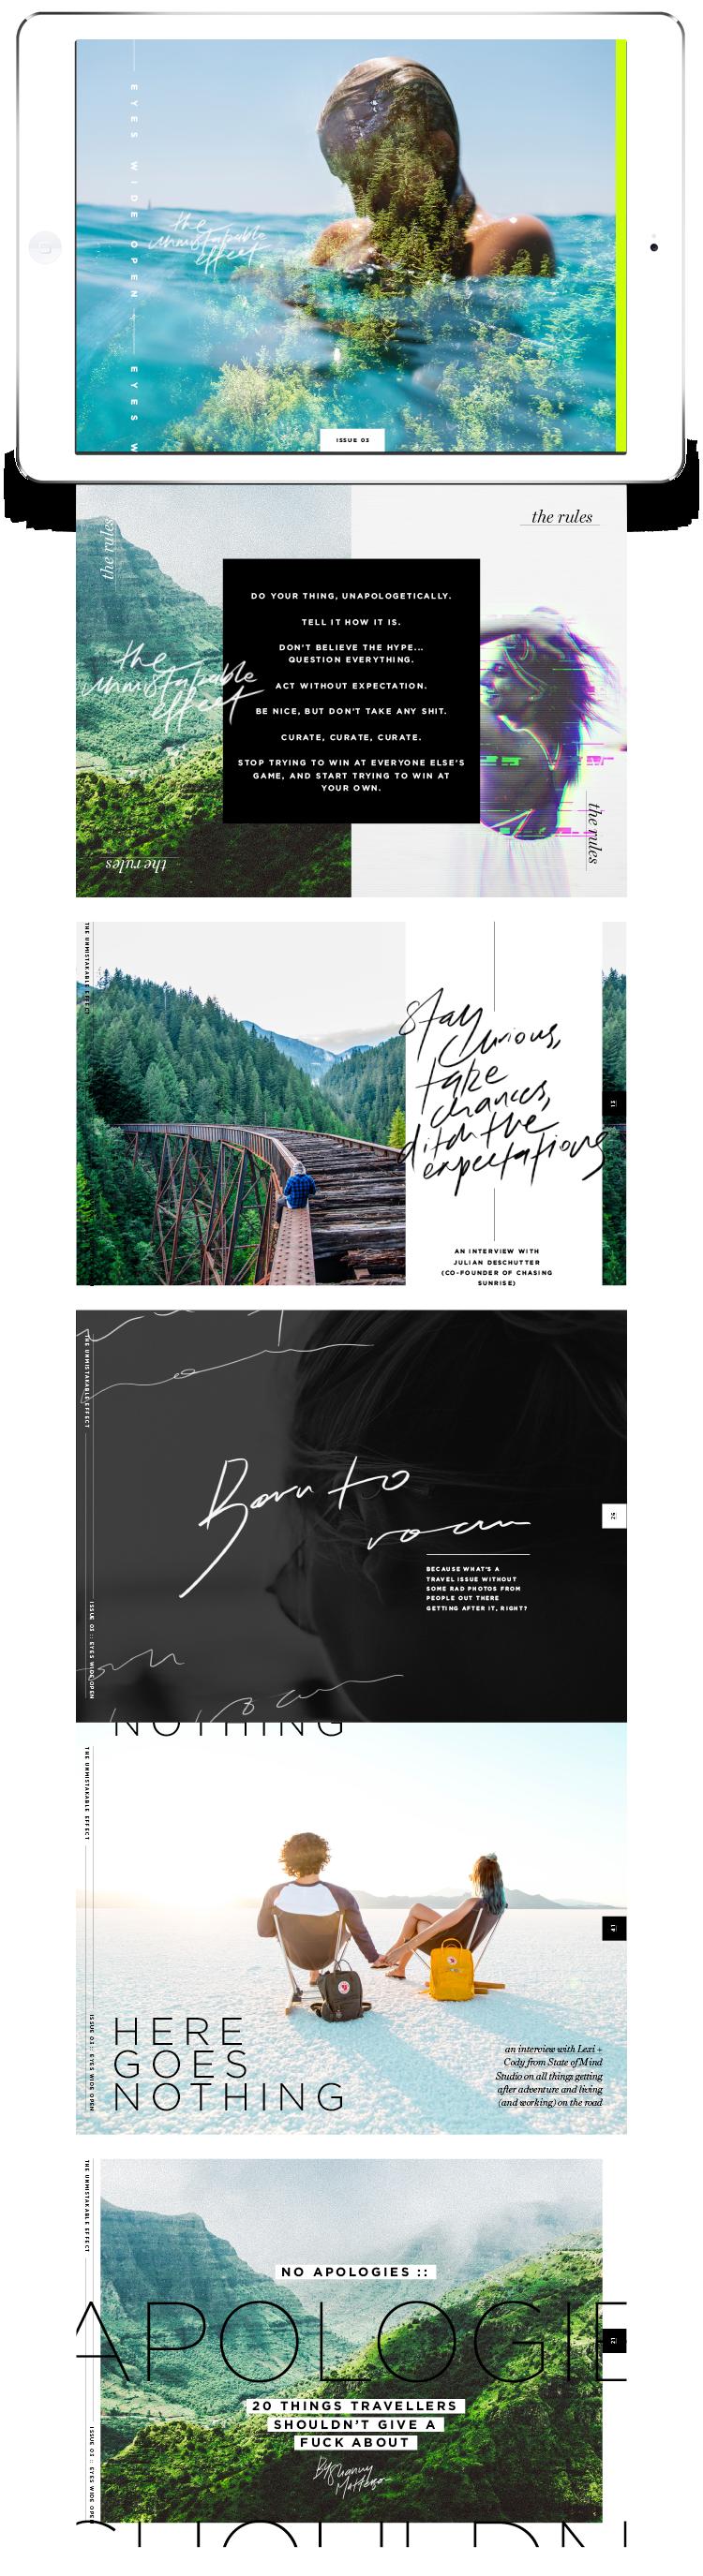 The Unmistakable Effect :: Digital Magazine | theunmistakableeffect.co